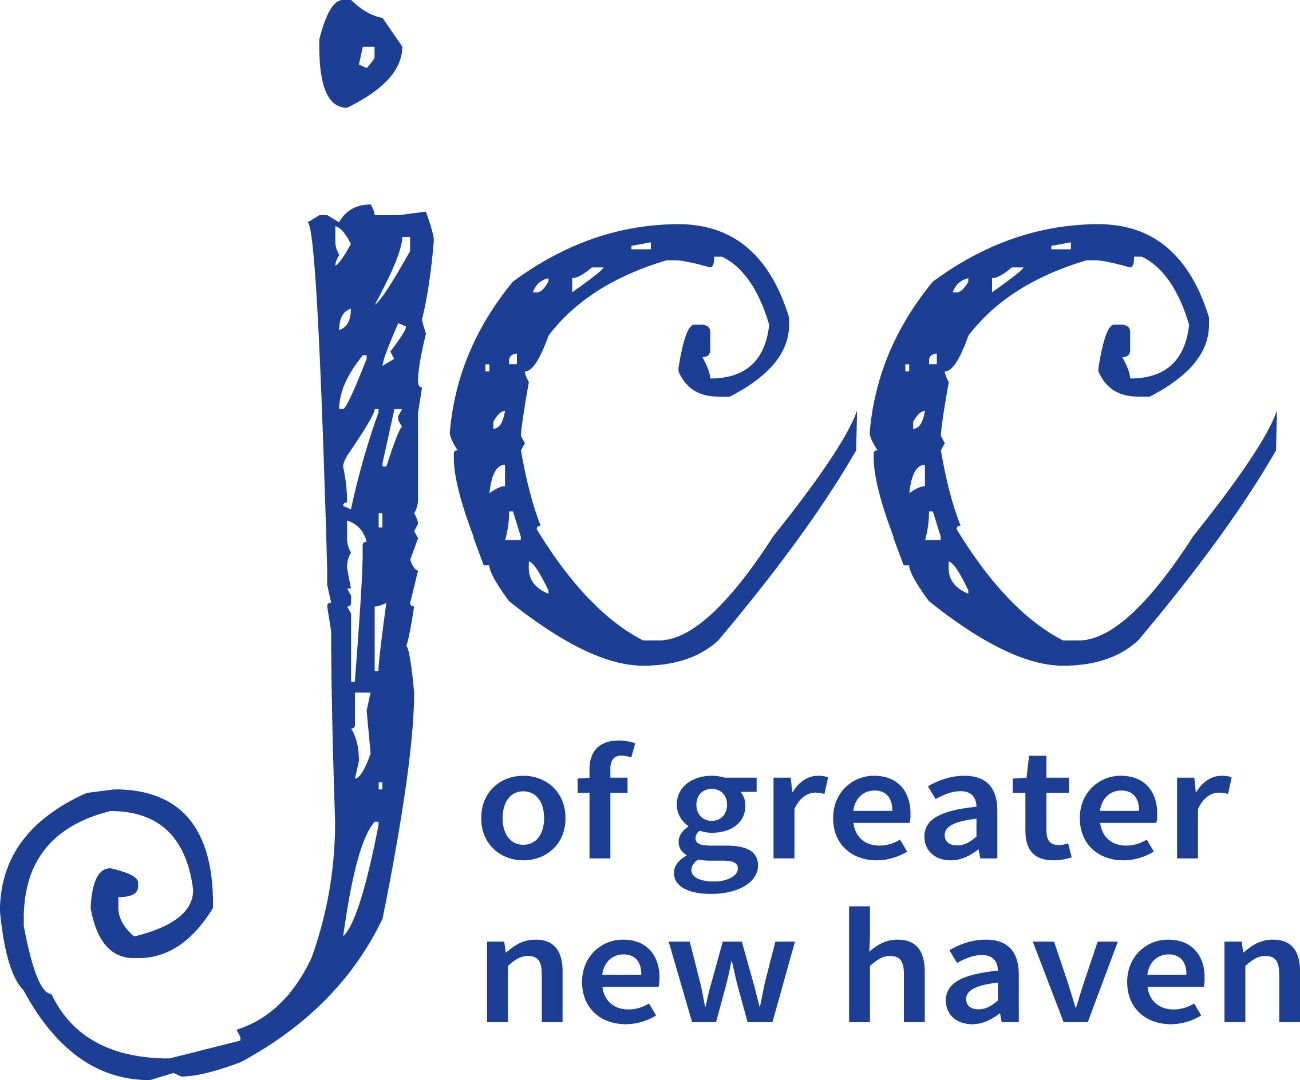 JCC%202013%20logo_large.jpg